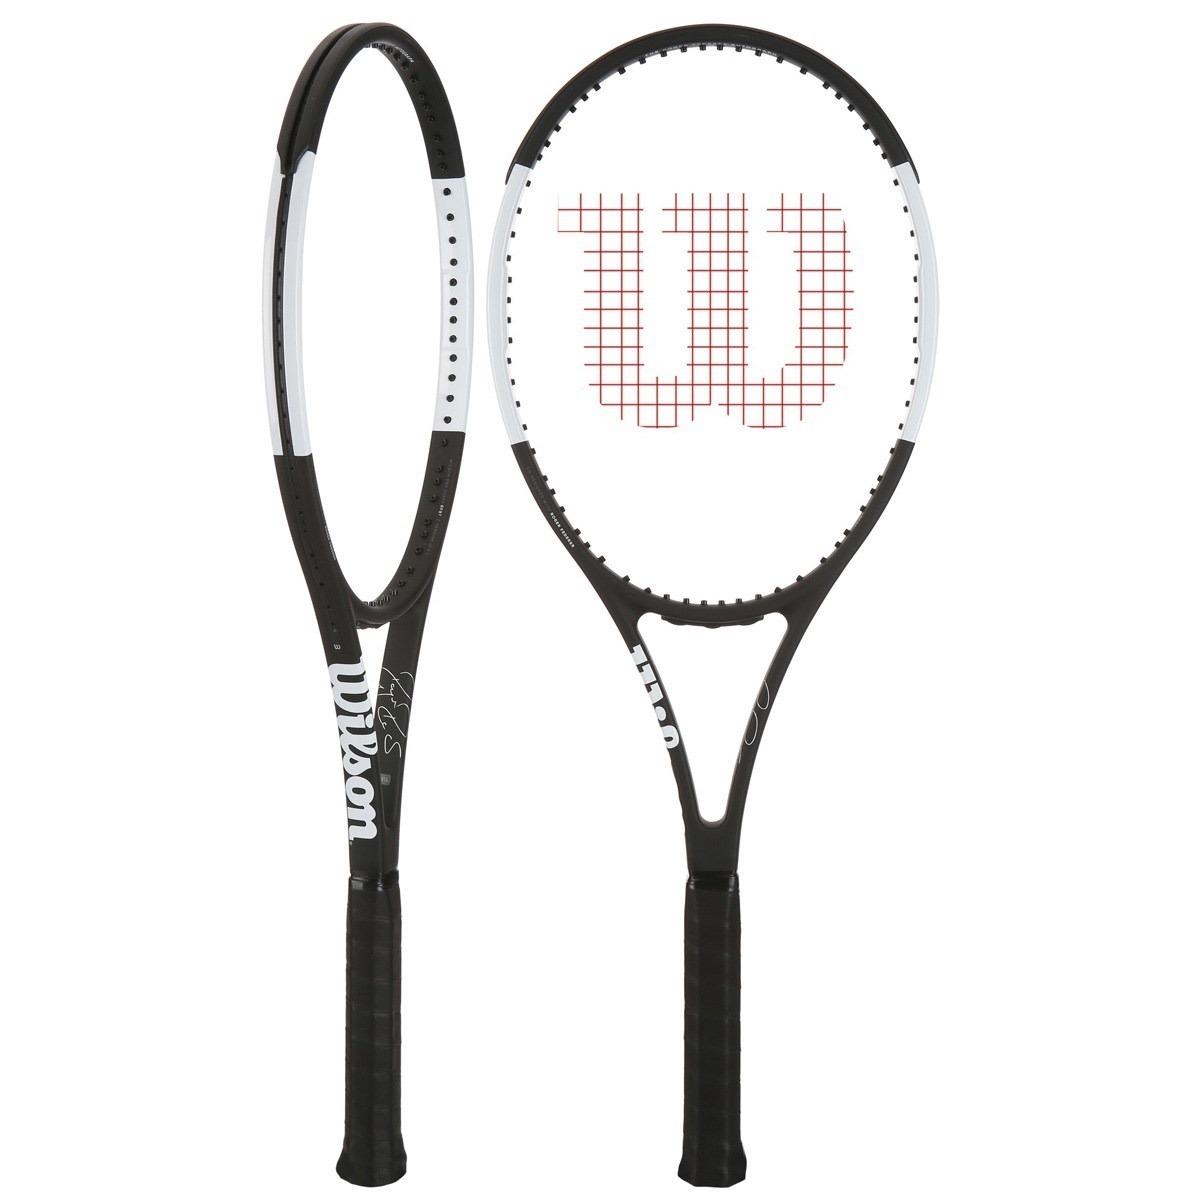 d33f336df raquete de tênis wilson pro staff 97l 2018 - new. Carregando zoom.